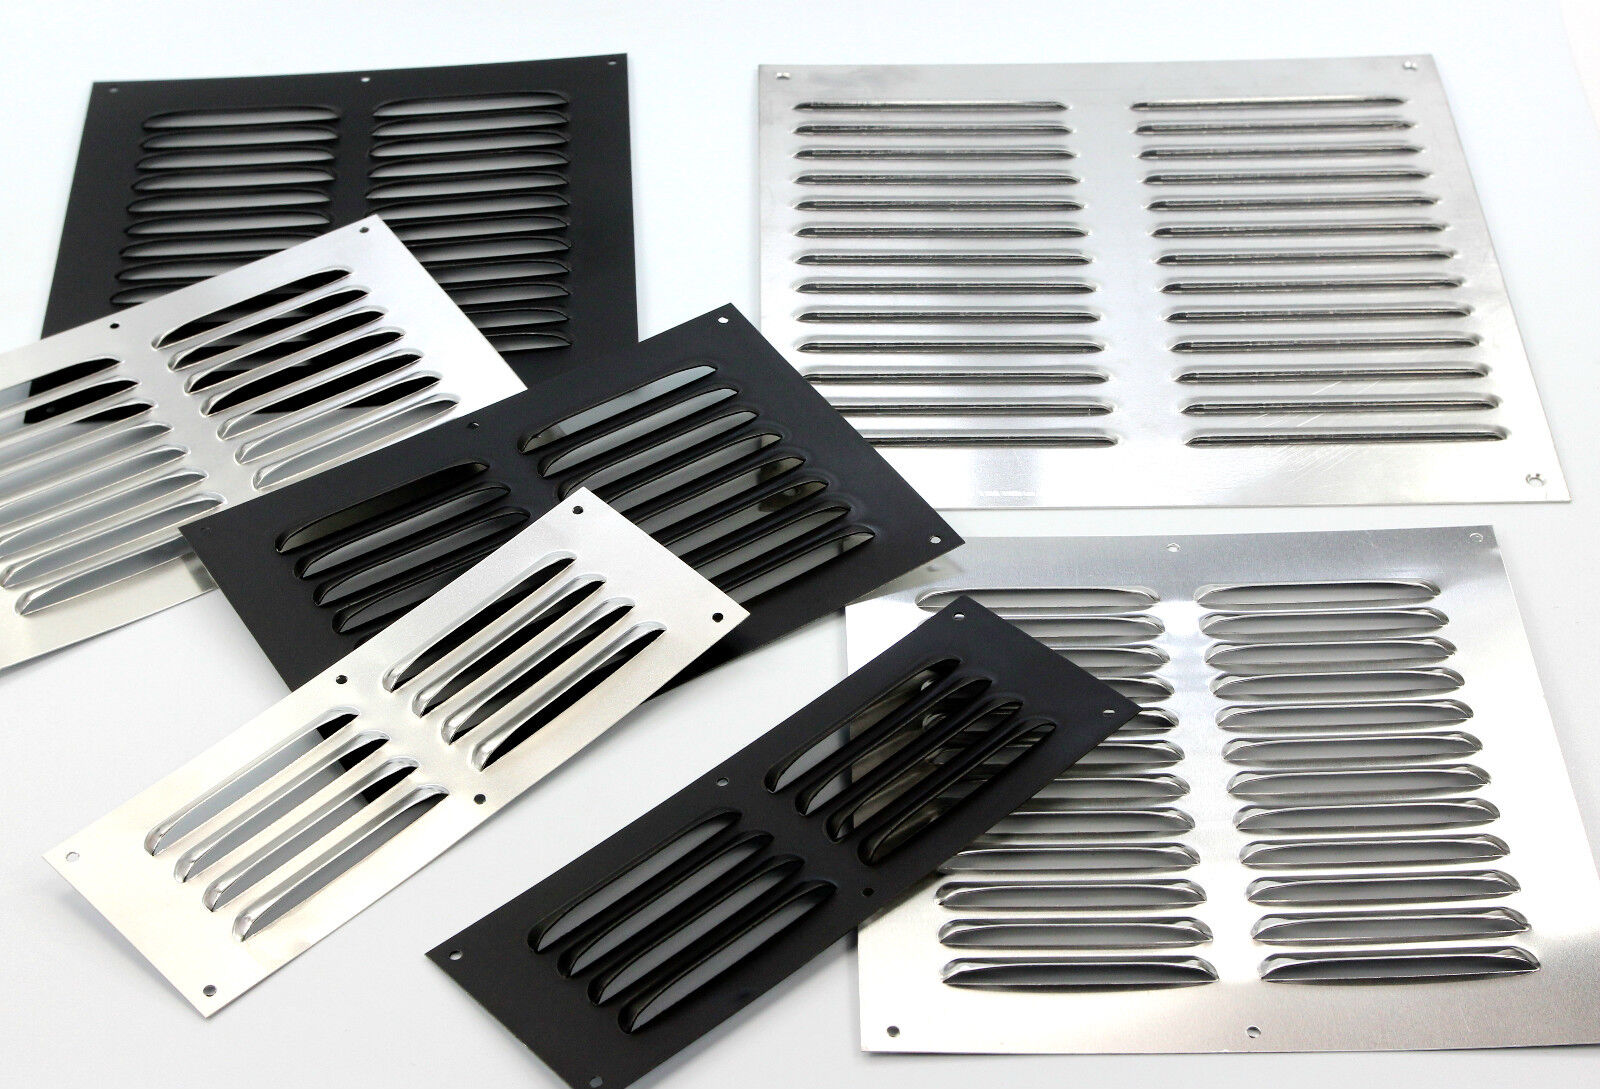 louvre air vent ventilation grill for walls doors caravans. Black Bedroom Furniture Sets. Home Design Ideas